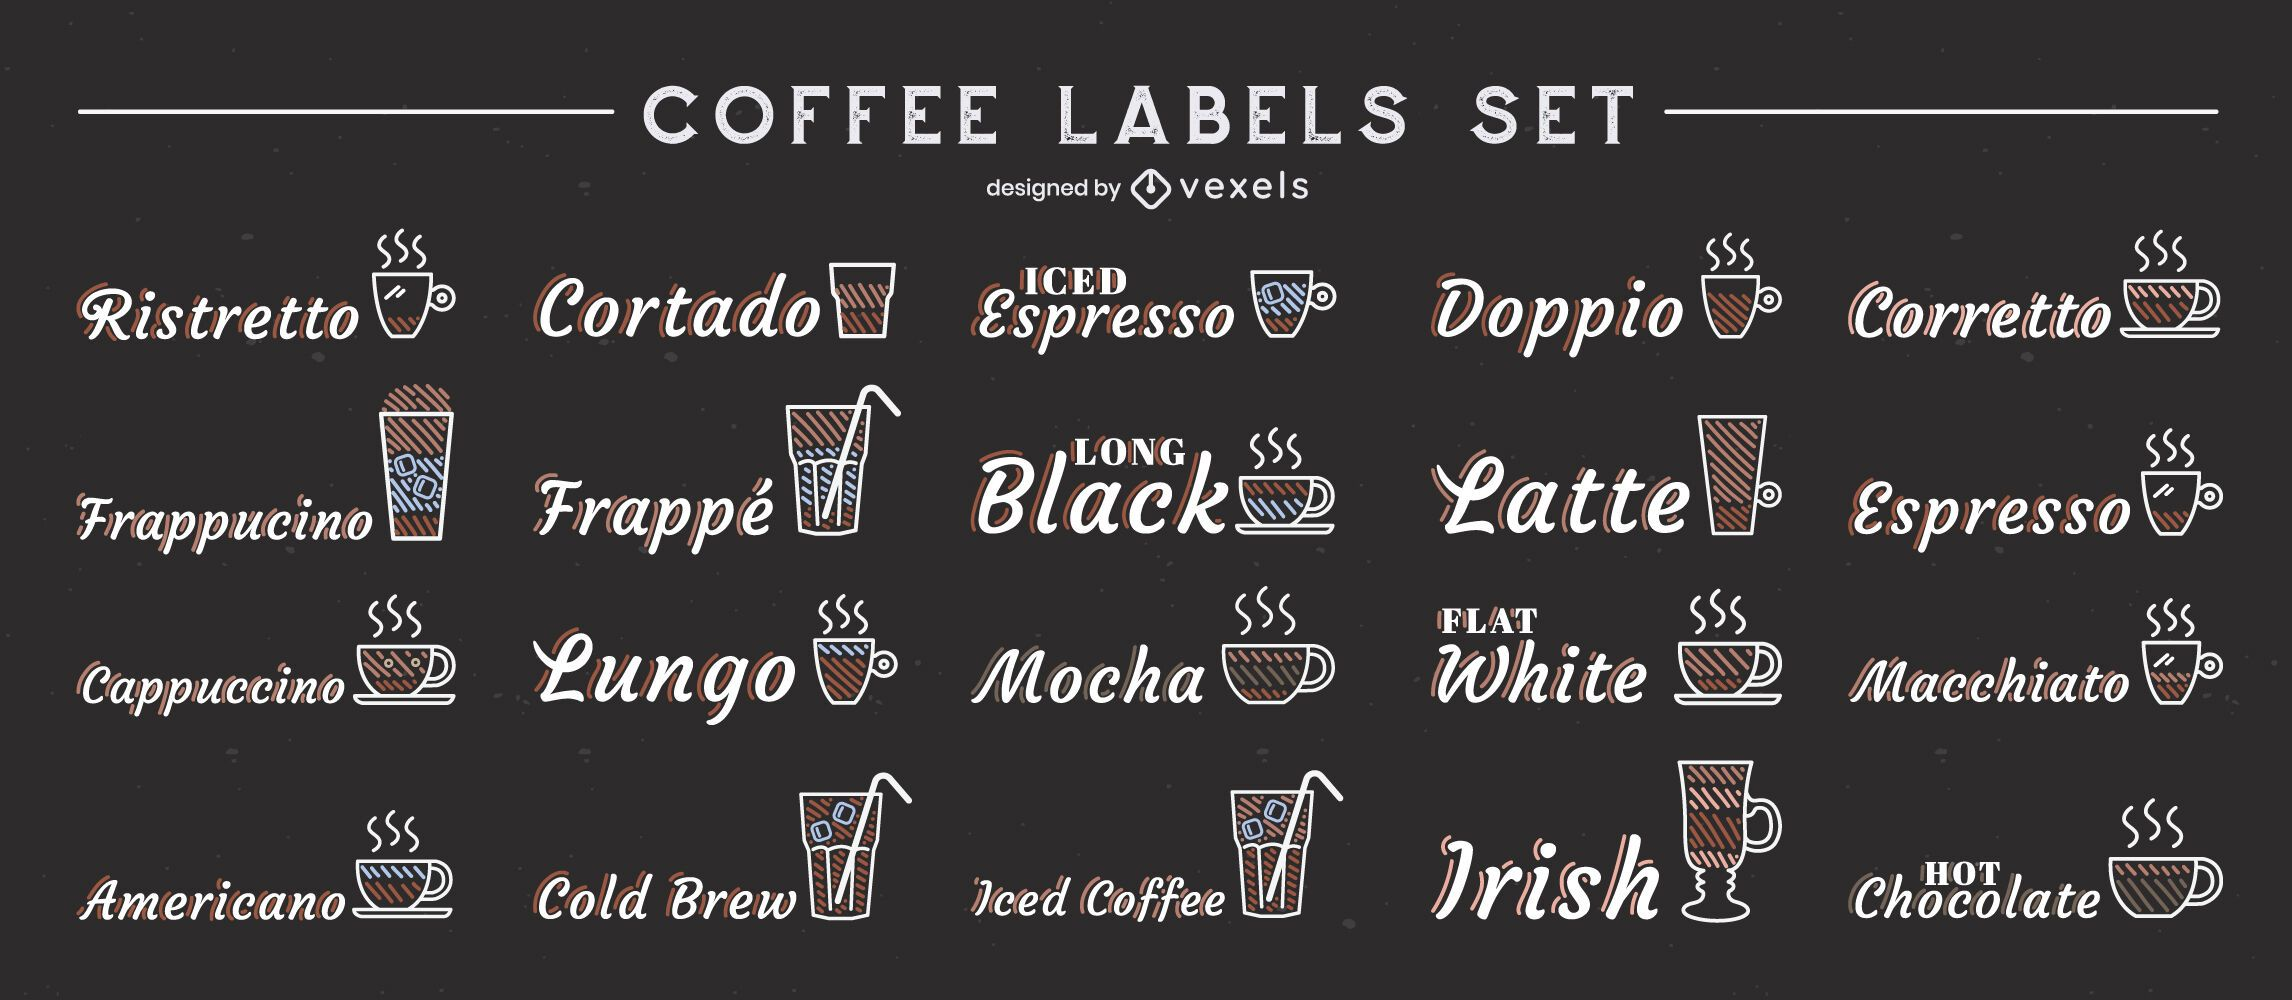 Kaffeegetränke Etikettenset